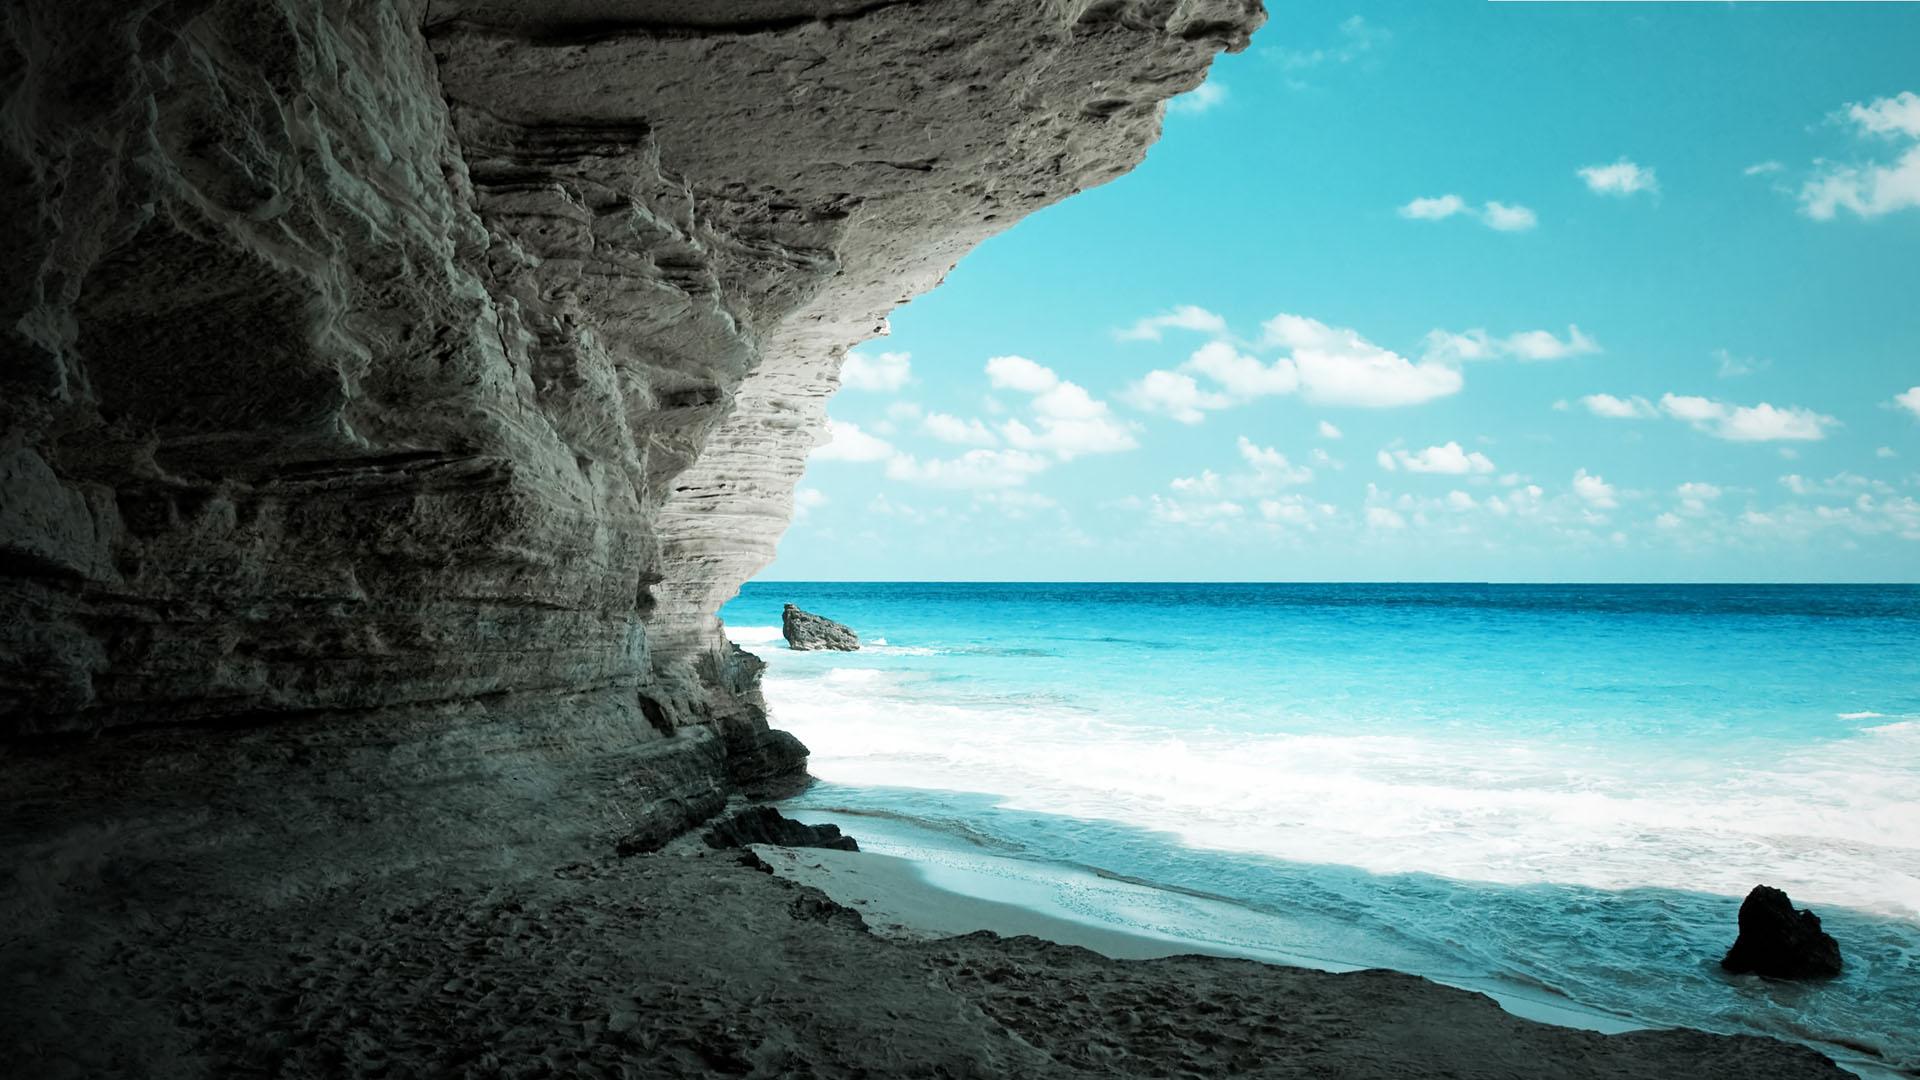 amazing full hd wallpaper cave on the beach wallpaper 1920x1080